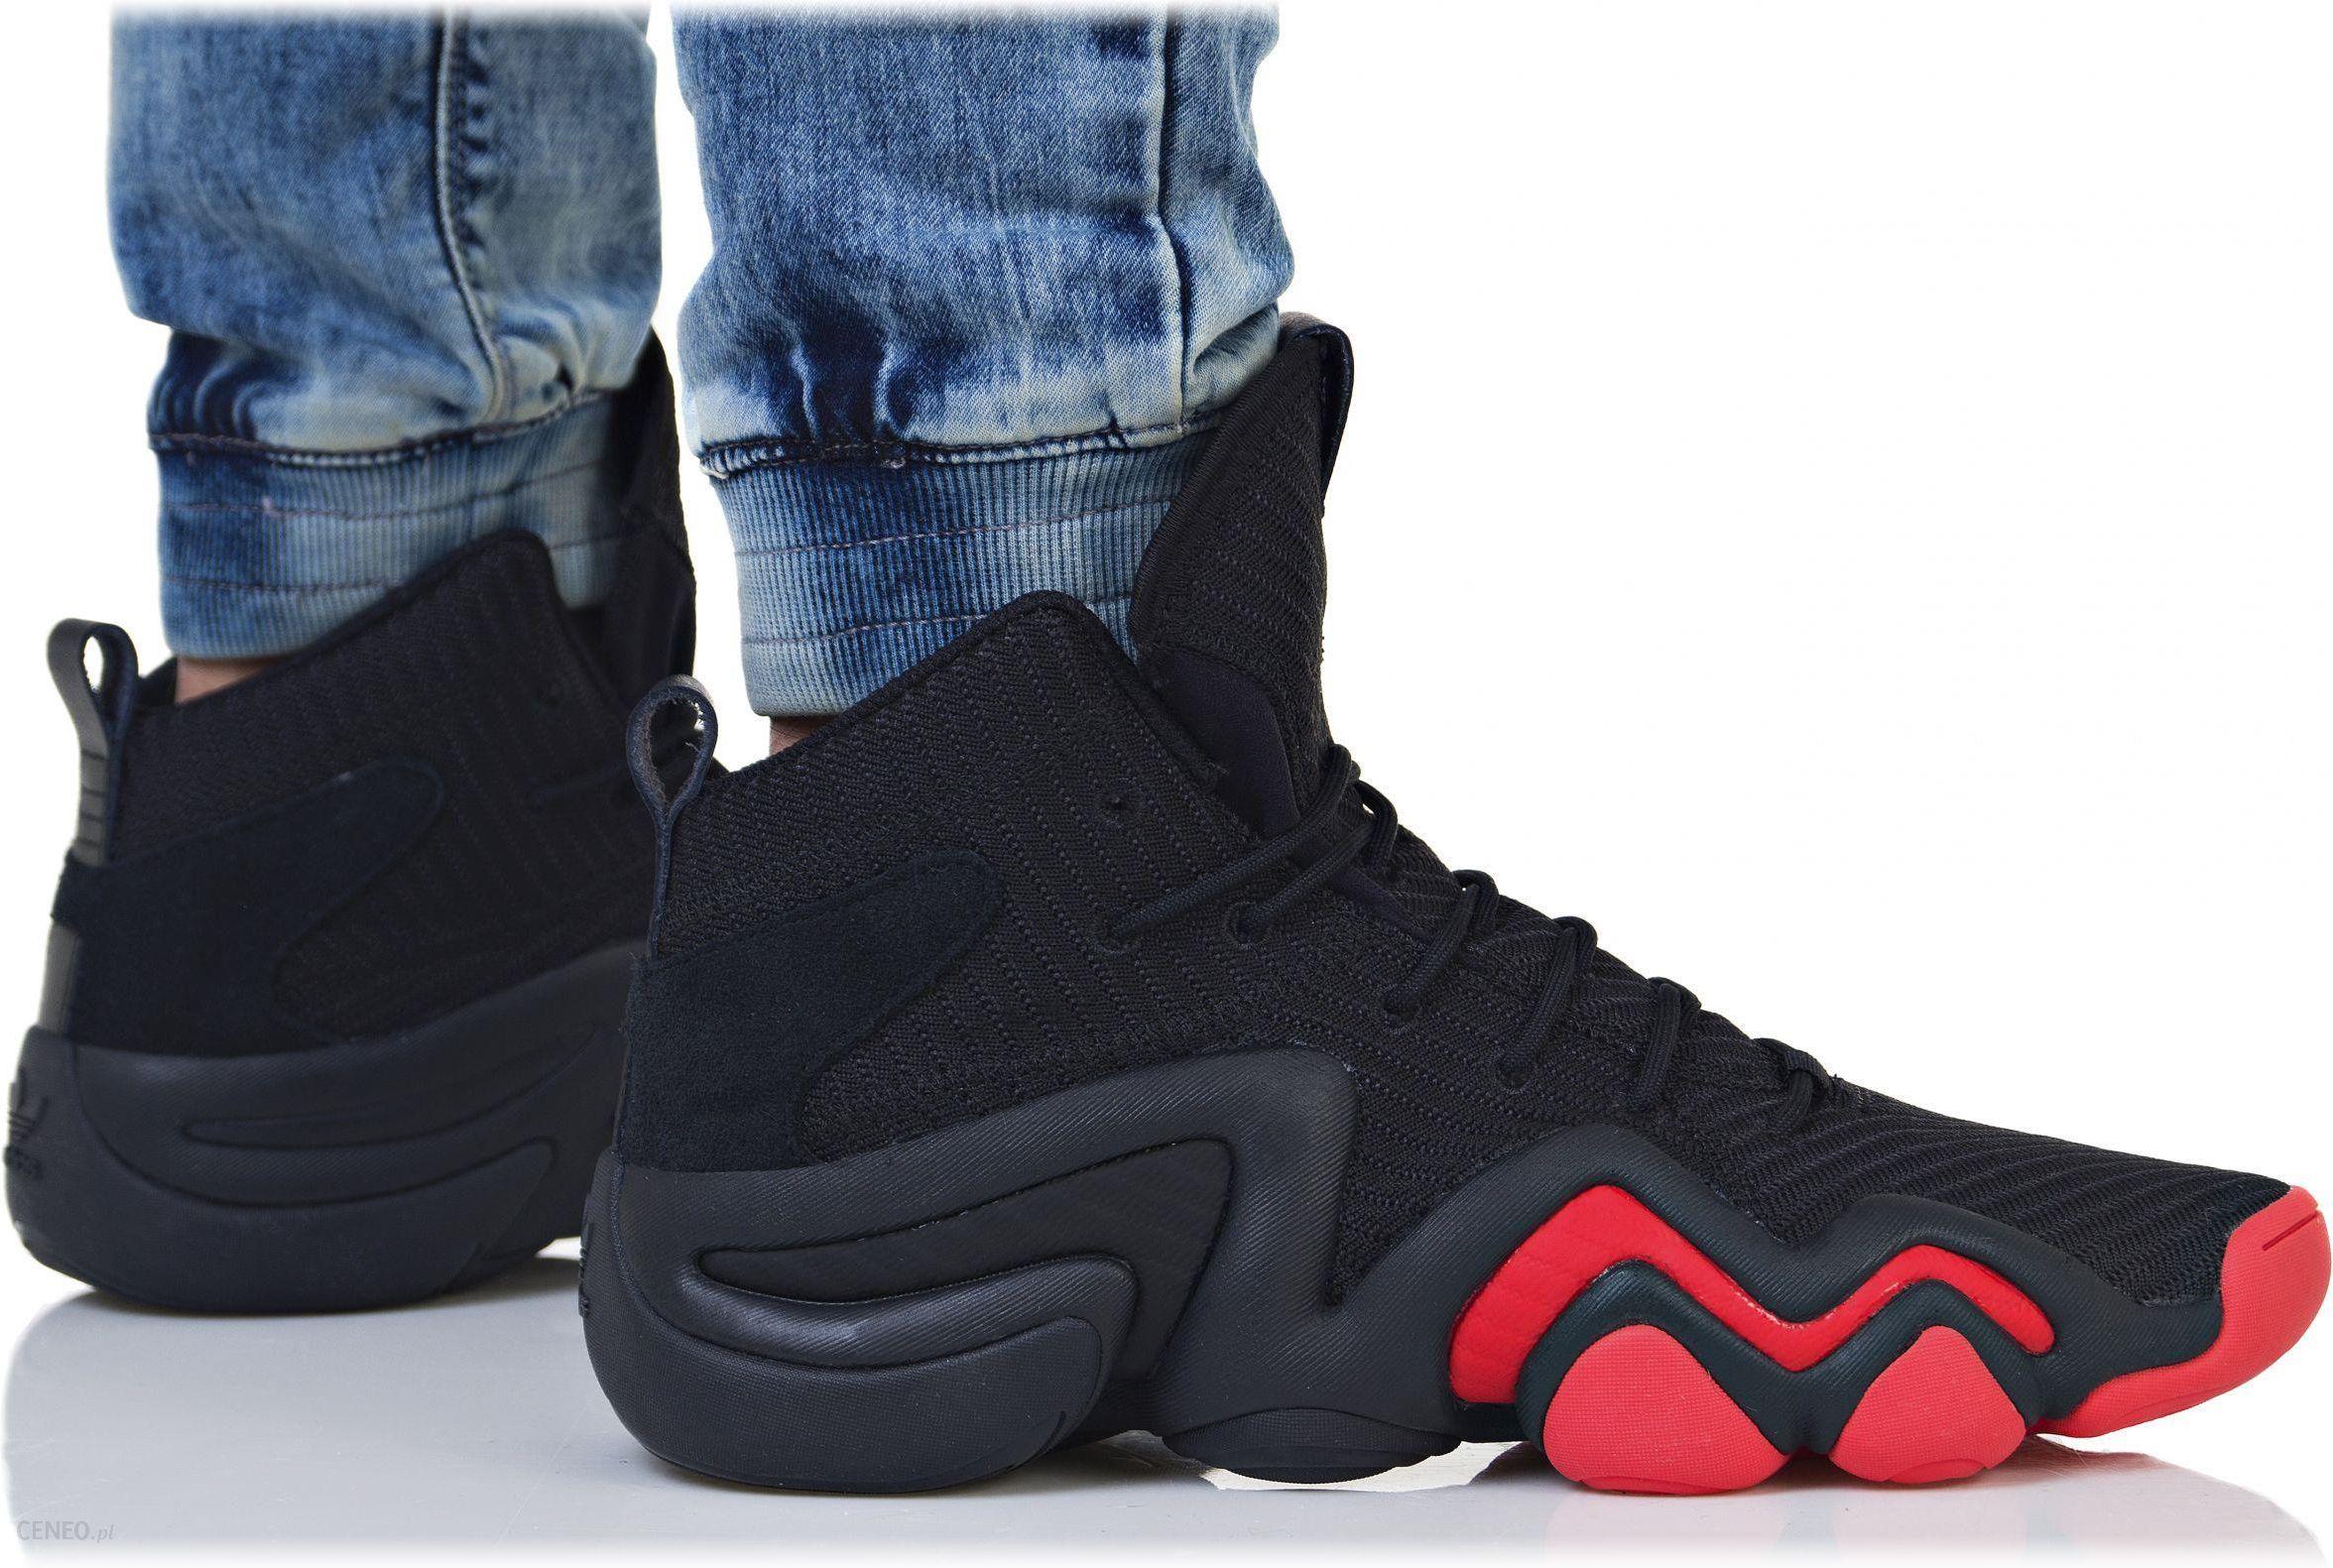 purchase cheap 8a280 5cf6c Buty Adidas Męskie Crazy 8 Adv Ck CQ0986 Basket - zdjęcie 1